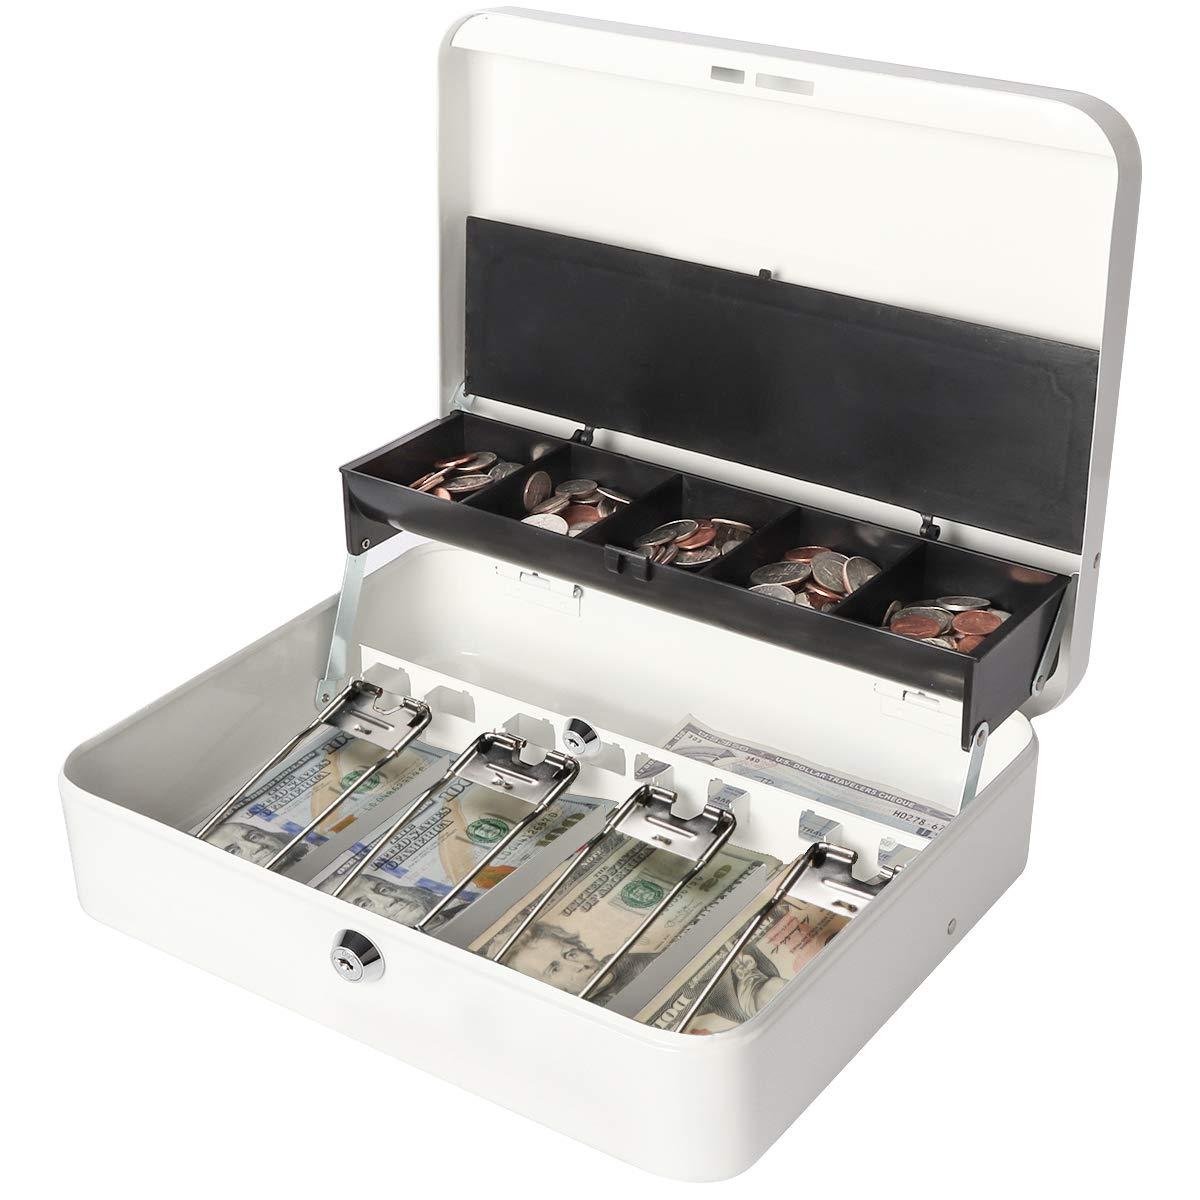 Jssmst Locking Large Metal Cash Box with Money Tray, Money Box with Key Lock, White, SM-CB0504L by Jssmst